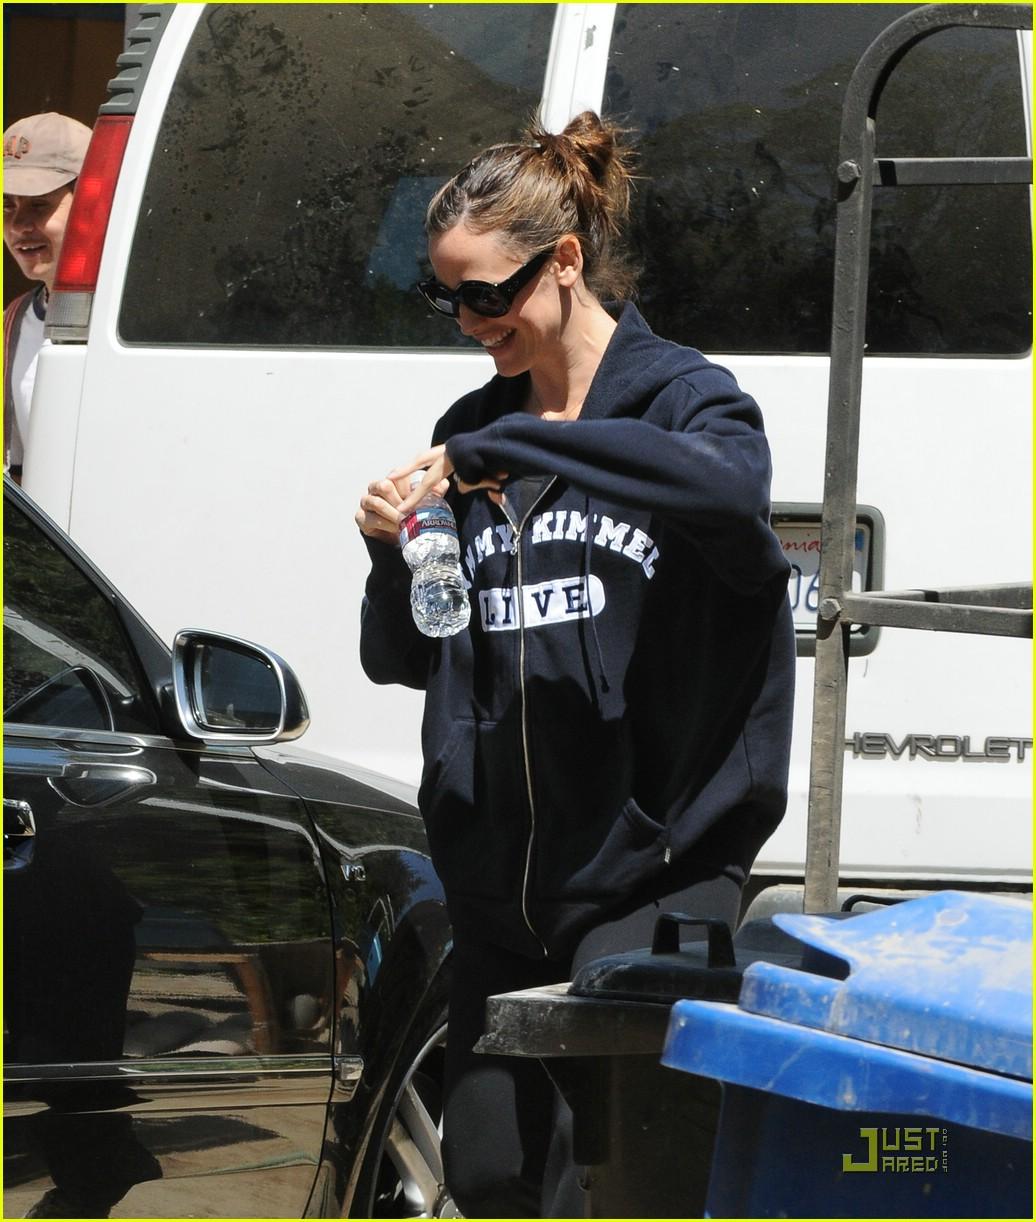 Jennifer Lopez Ben Affleck Jenny From the Block działanie bet at home